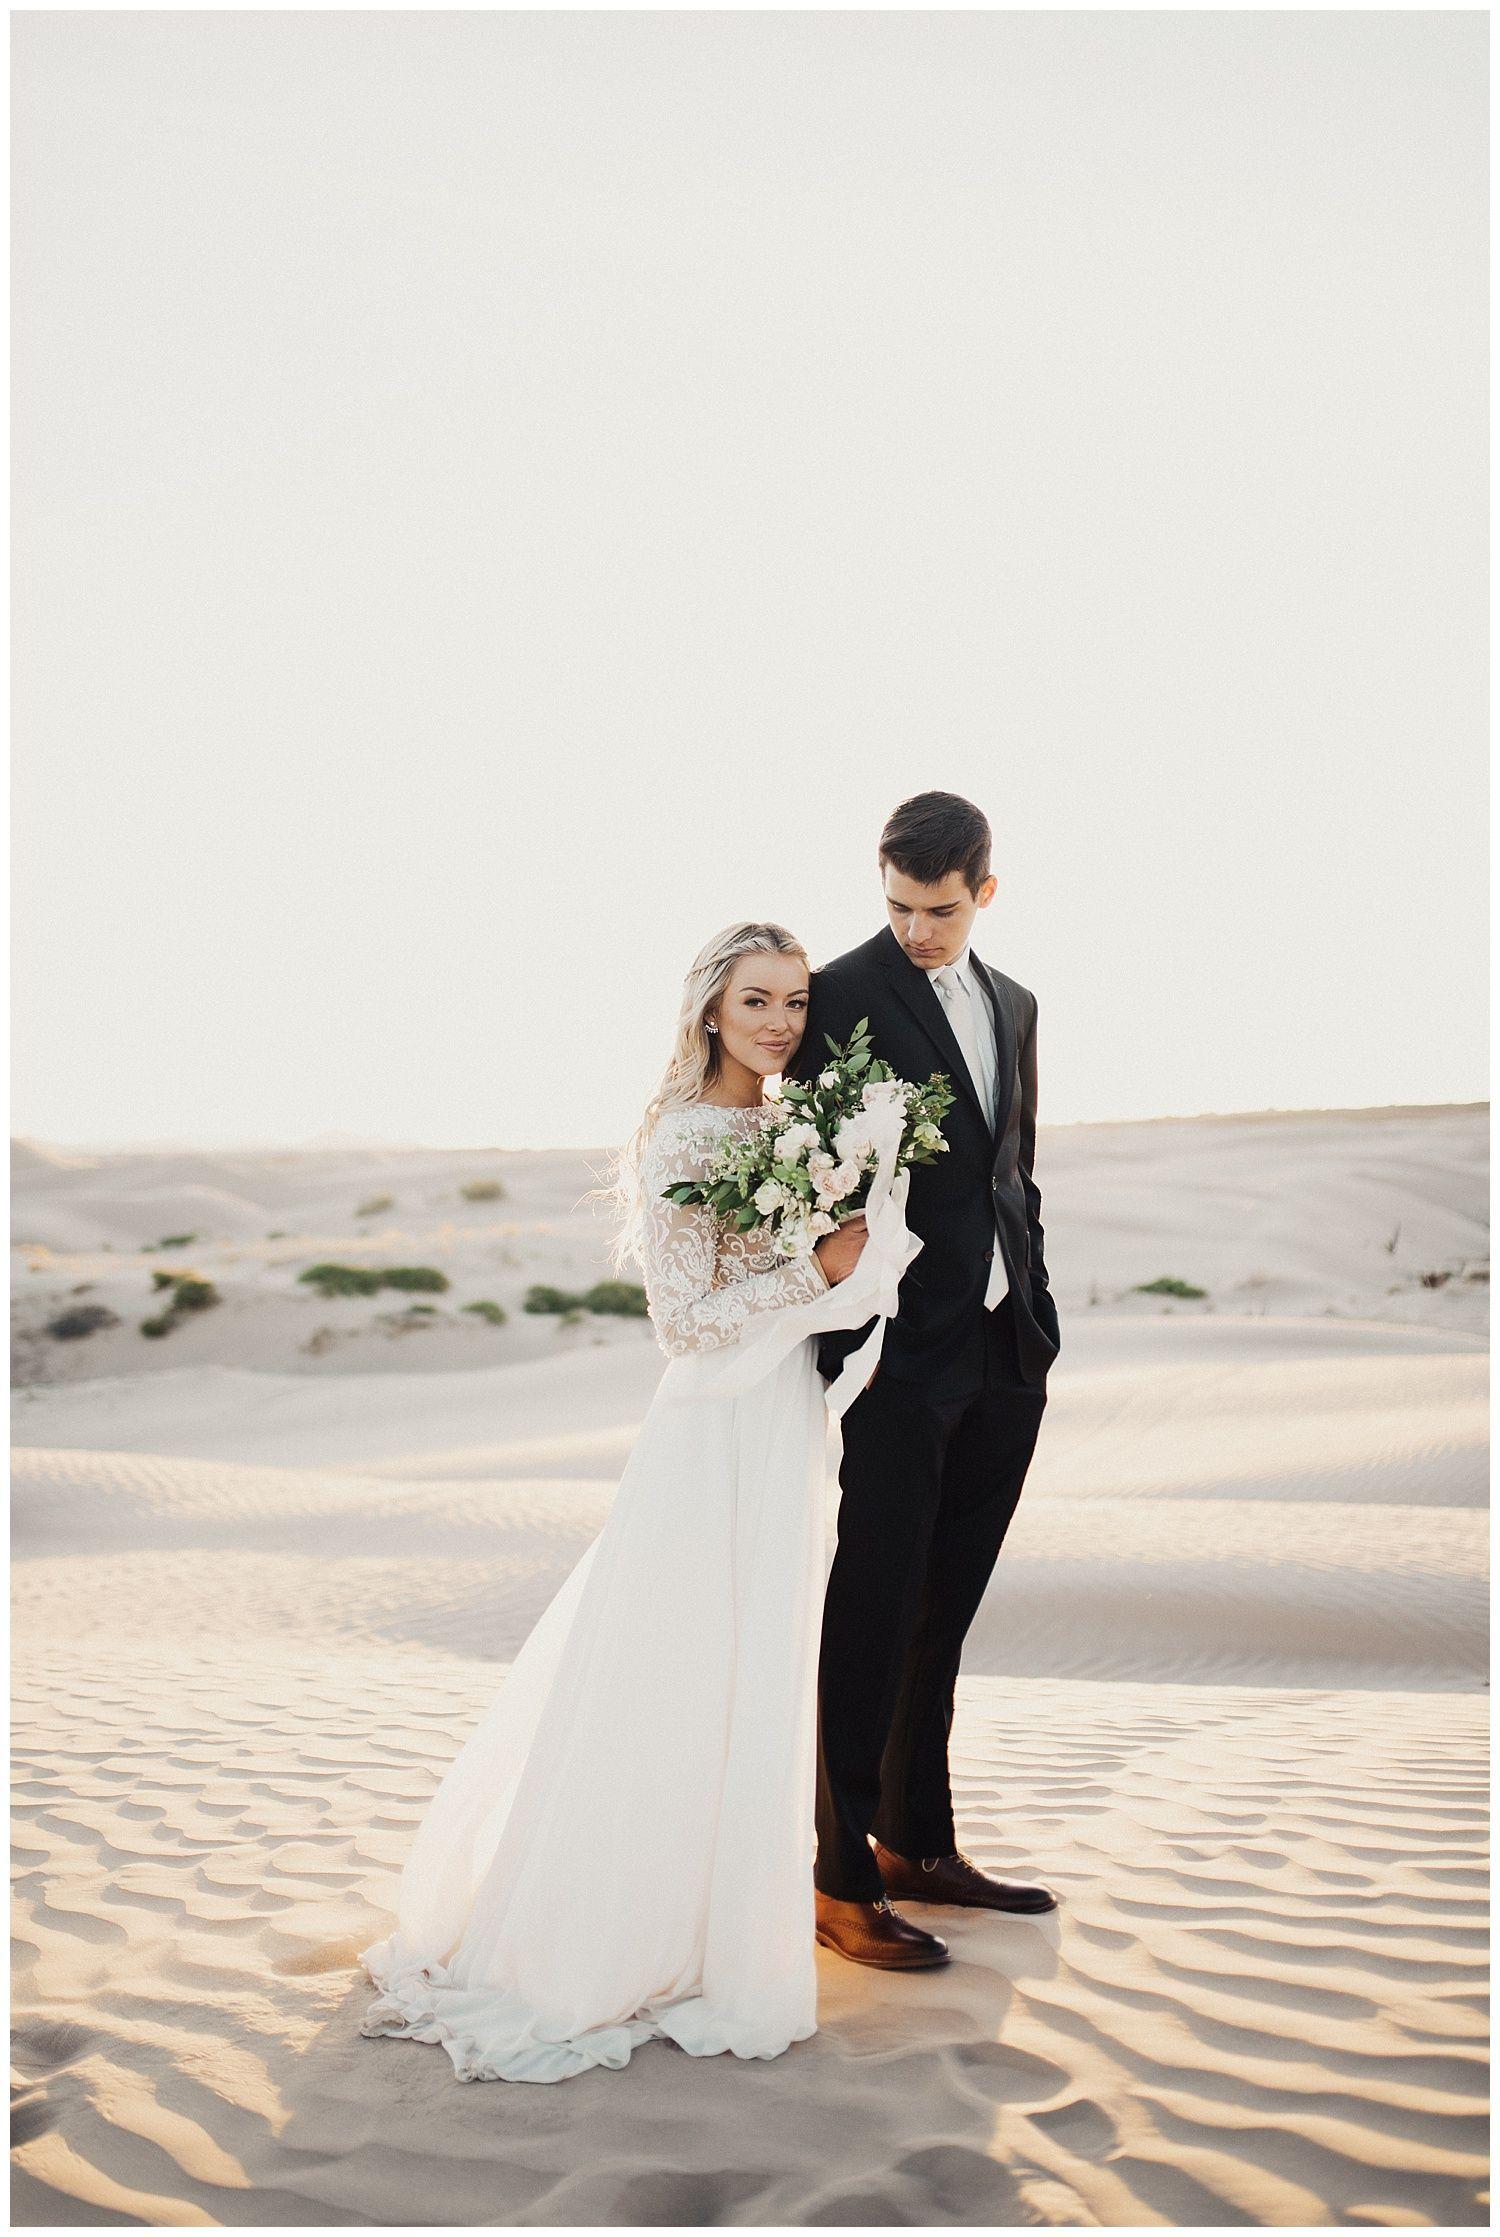 Modest long sleeve lace wedding dresses  Womens Dresses  PINPOSHCOM  trendyfashionstyle  Pinterest